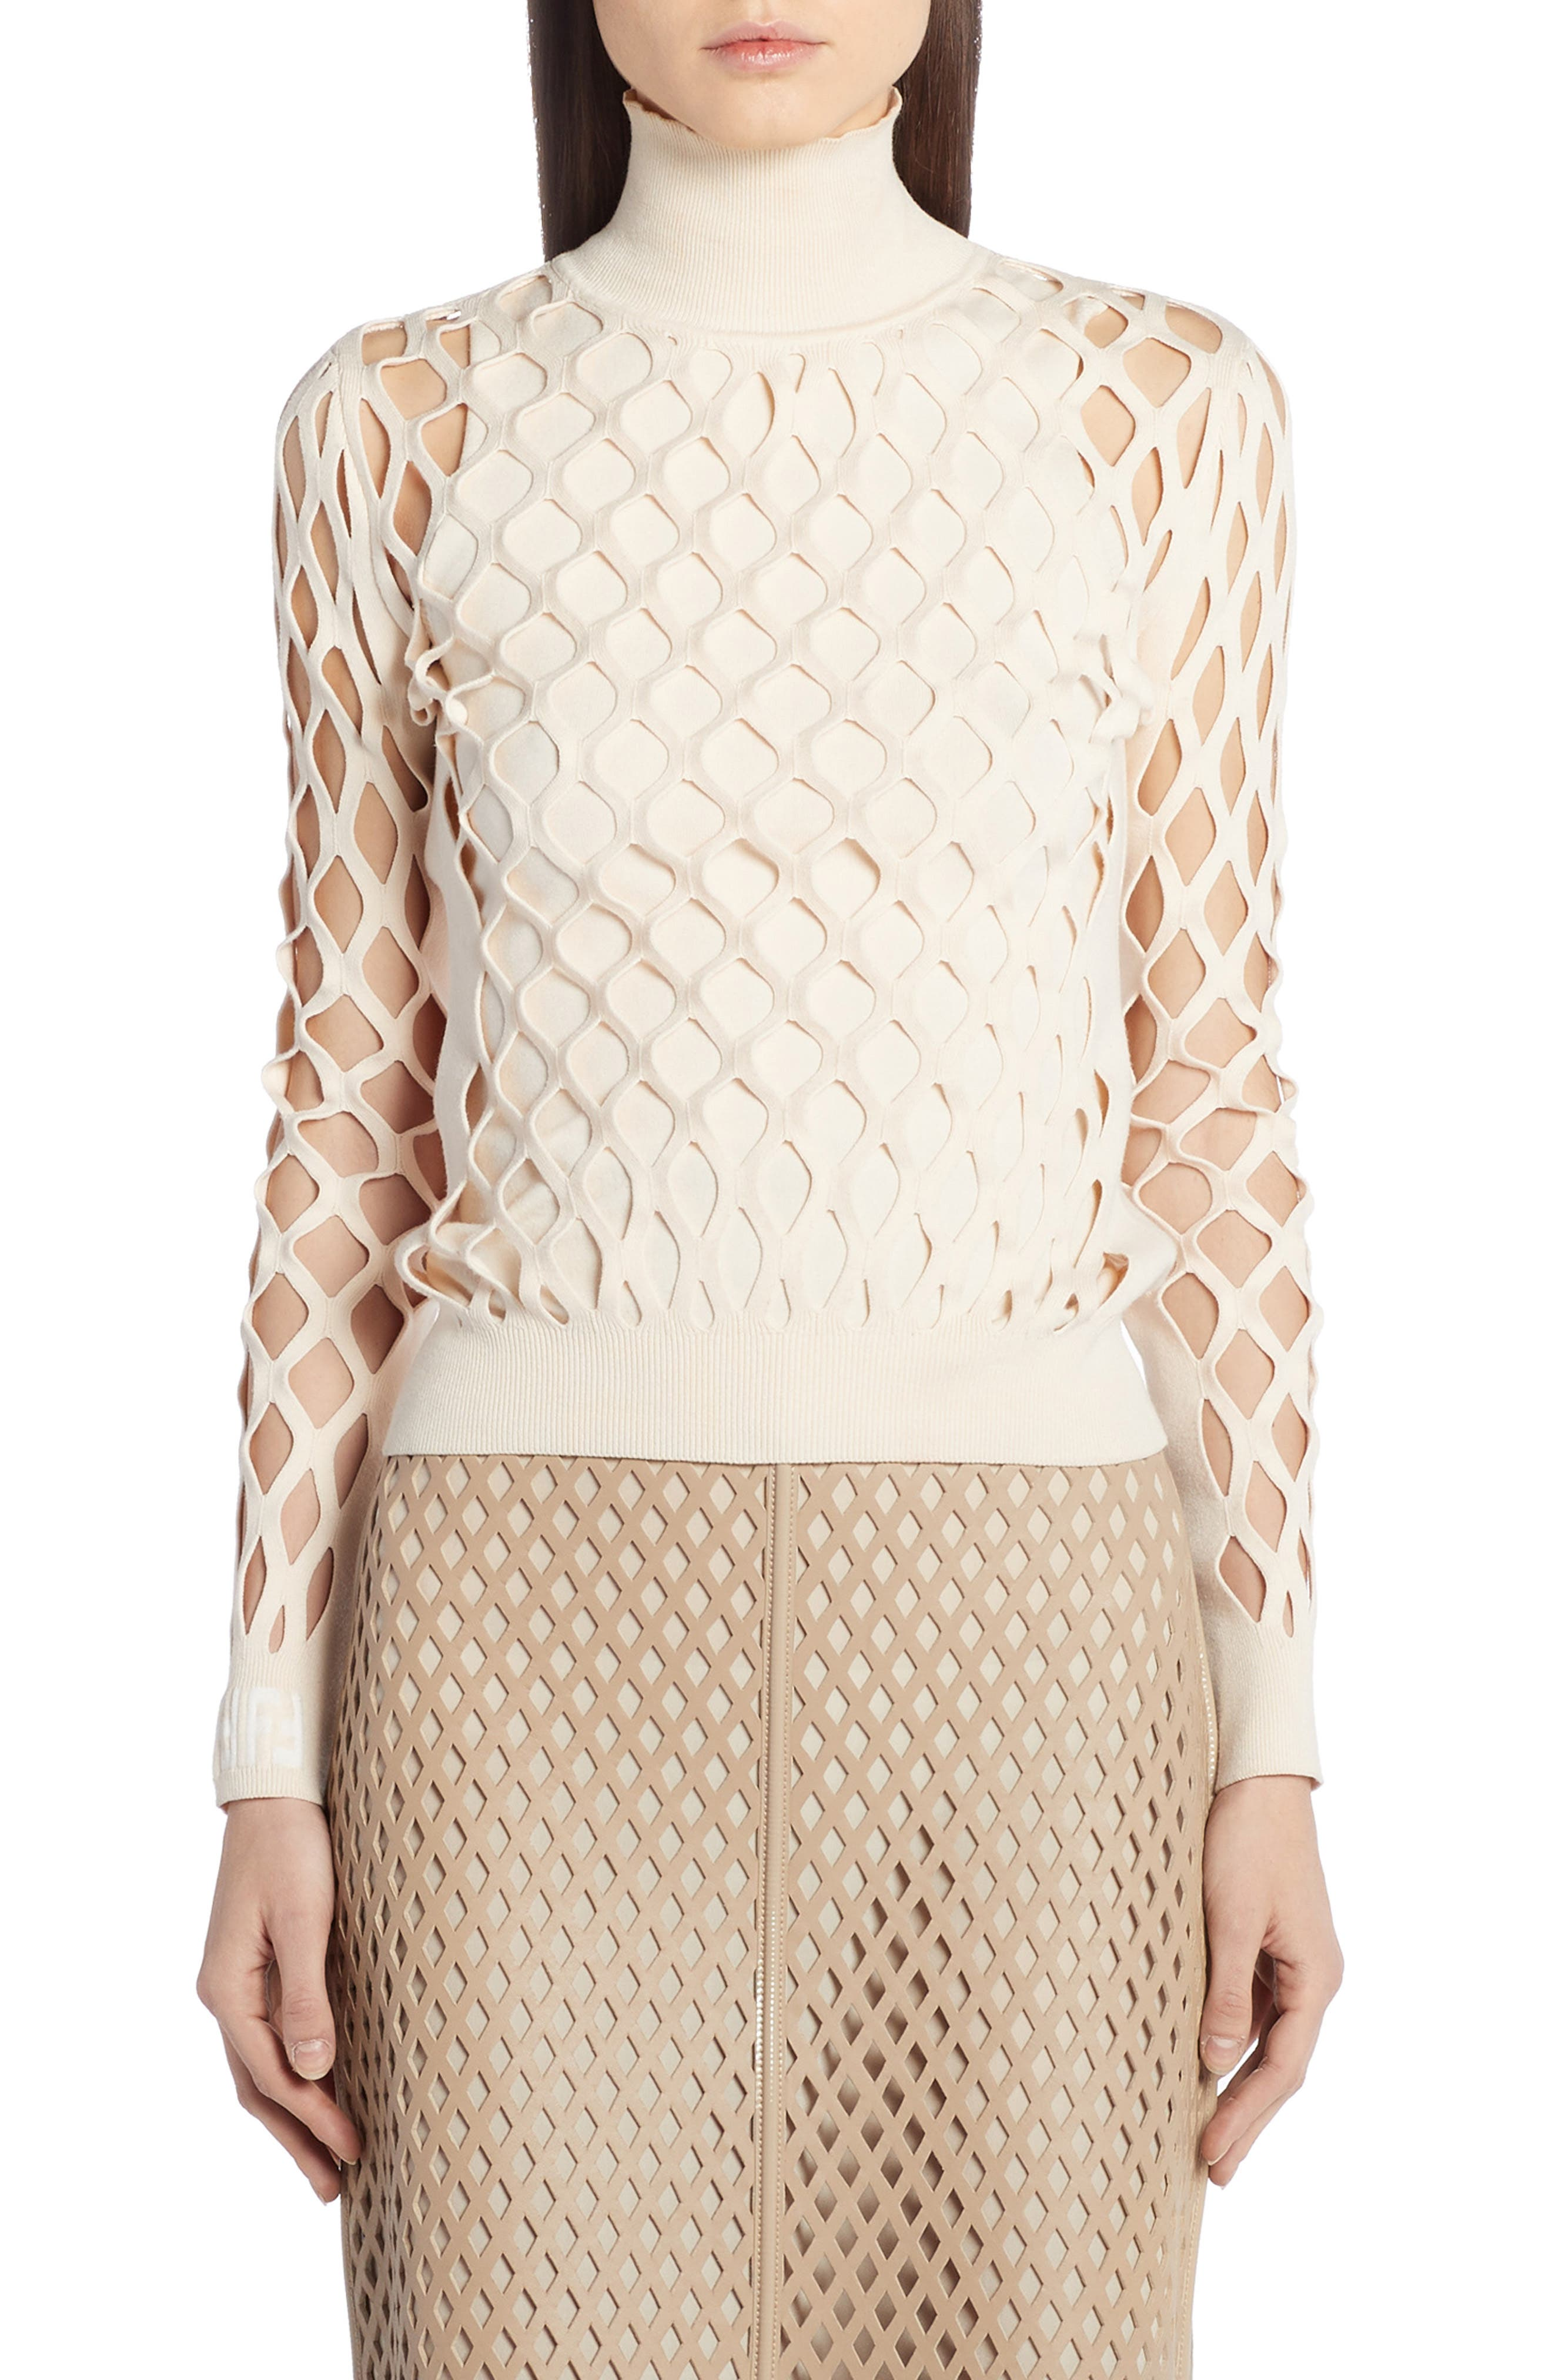 Fendi Tops Mesh Turtleneck Sweater